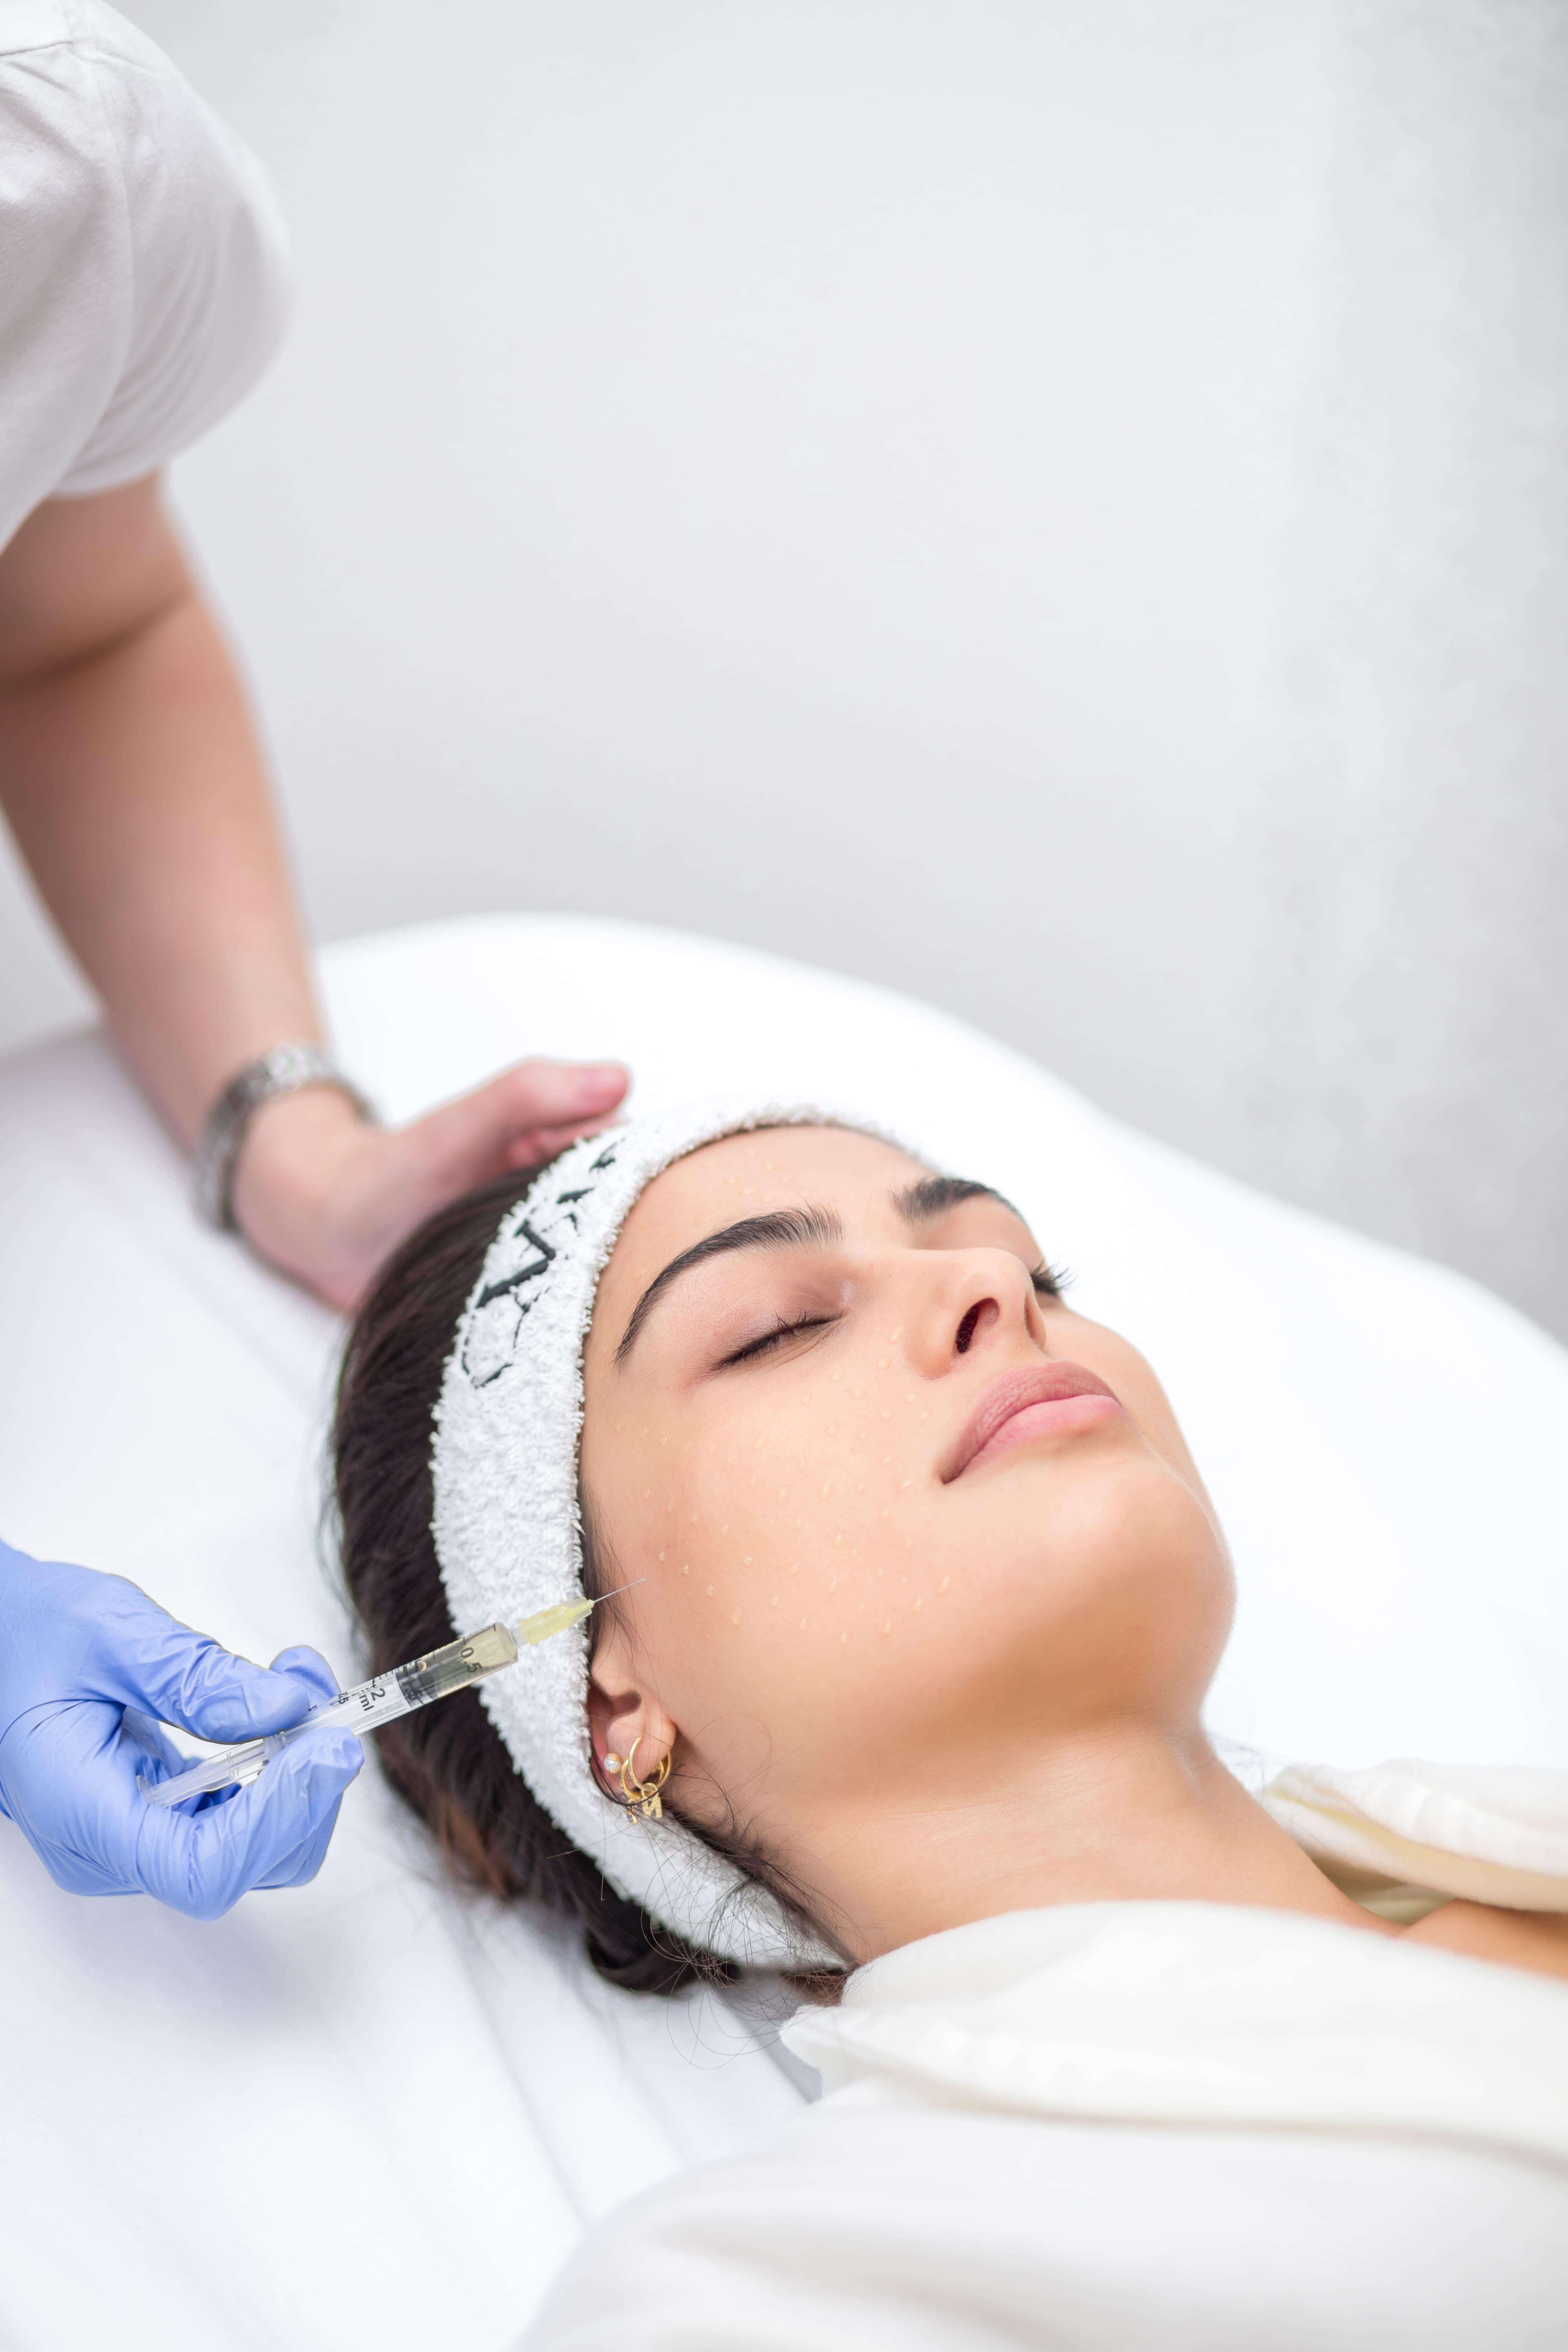 Mezoterapija ili biorevitalizacija ili skin boosteri